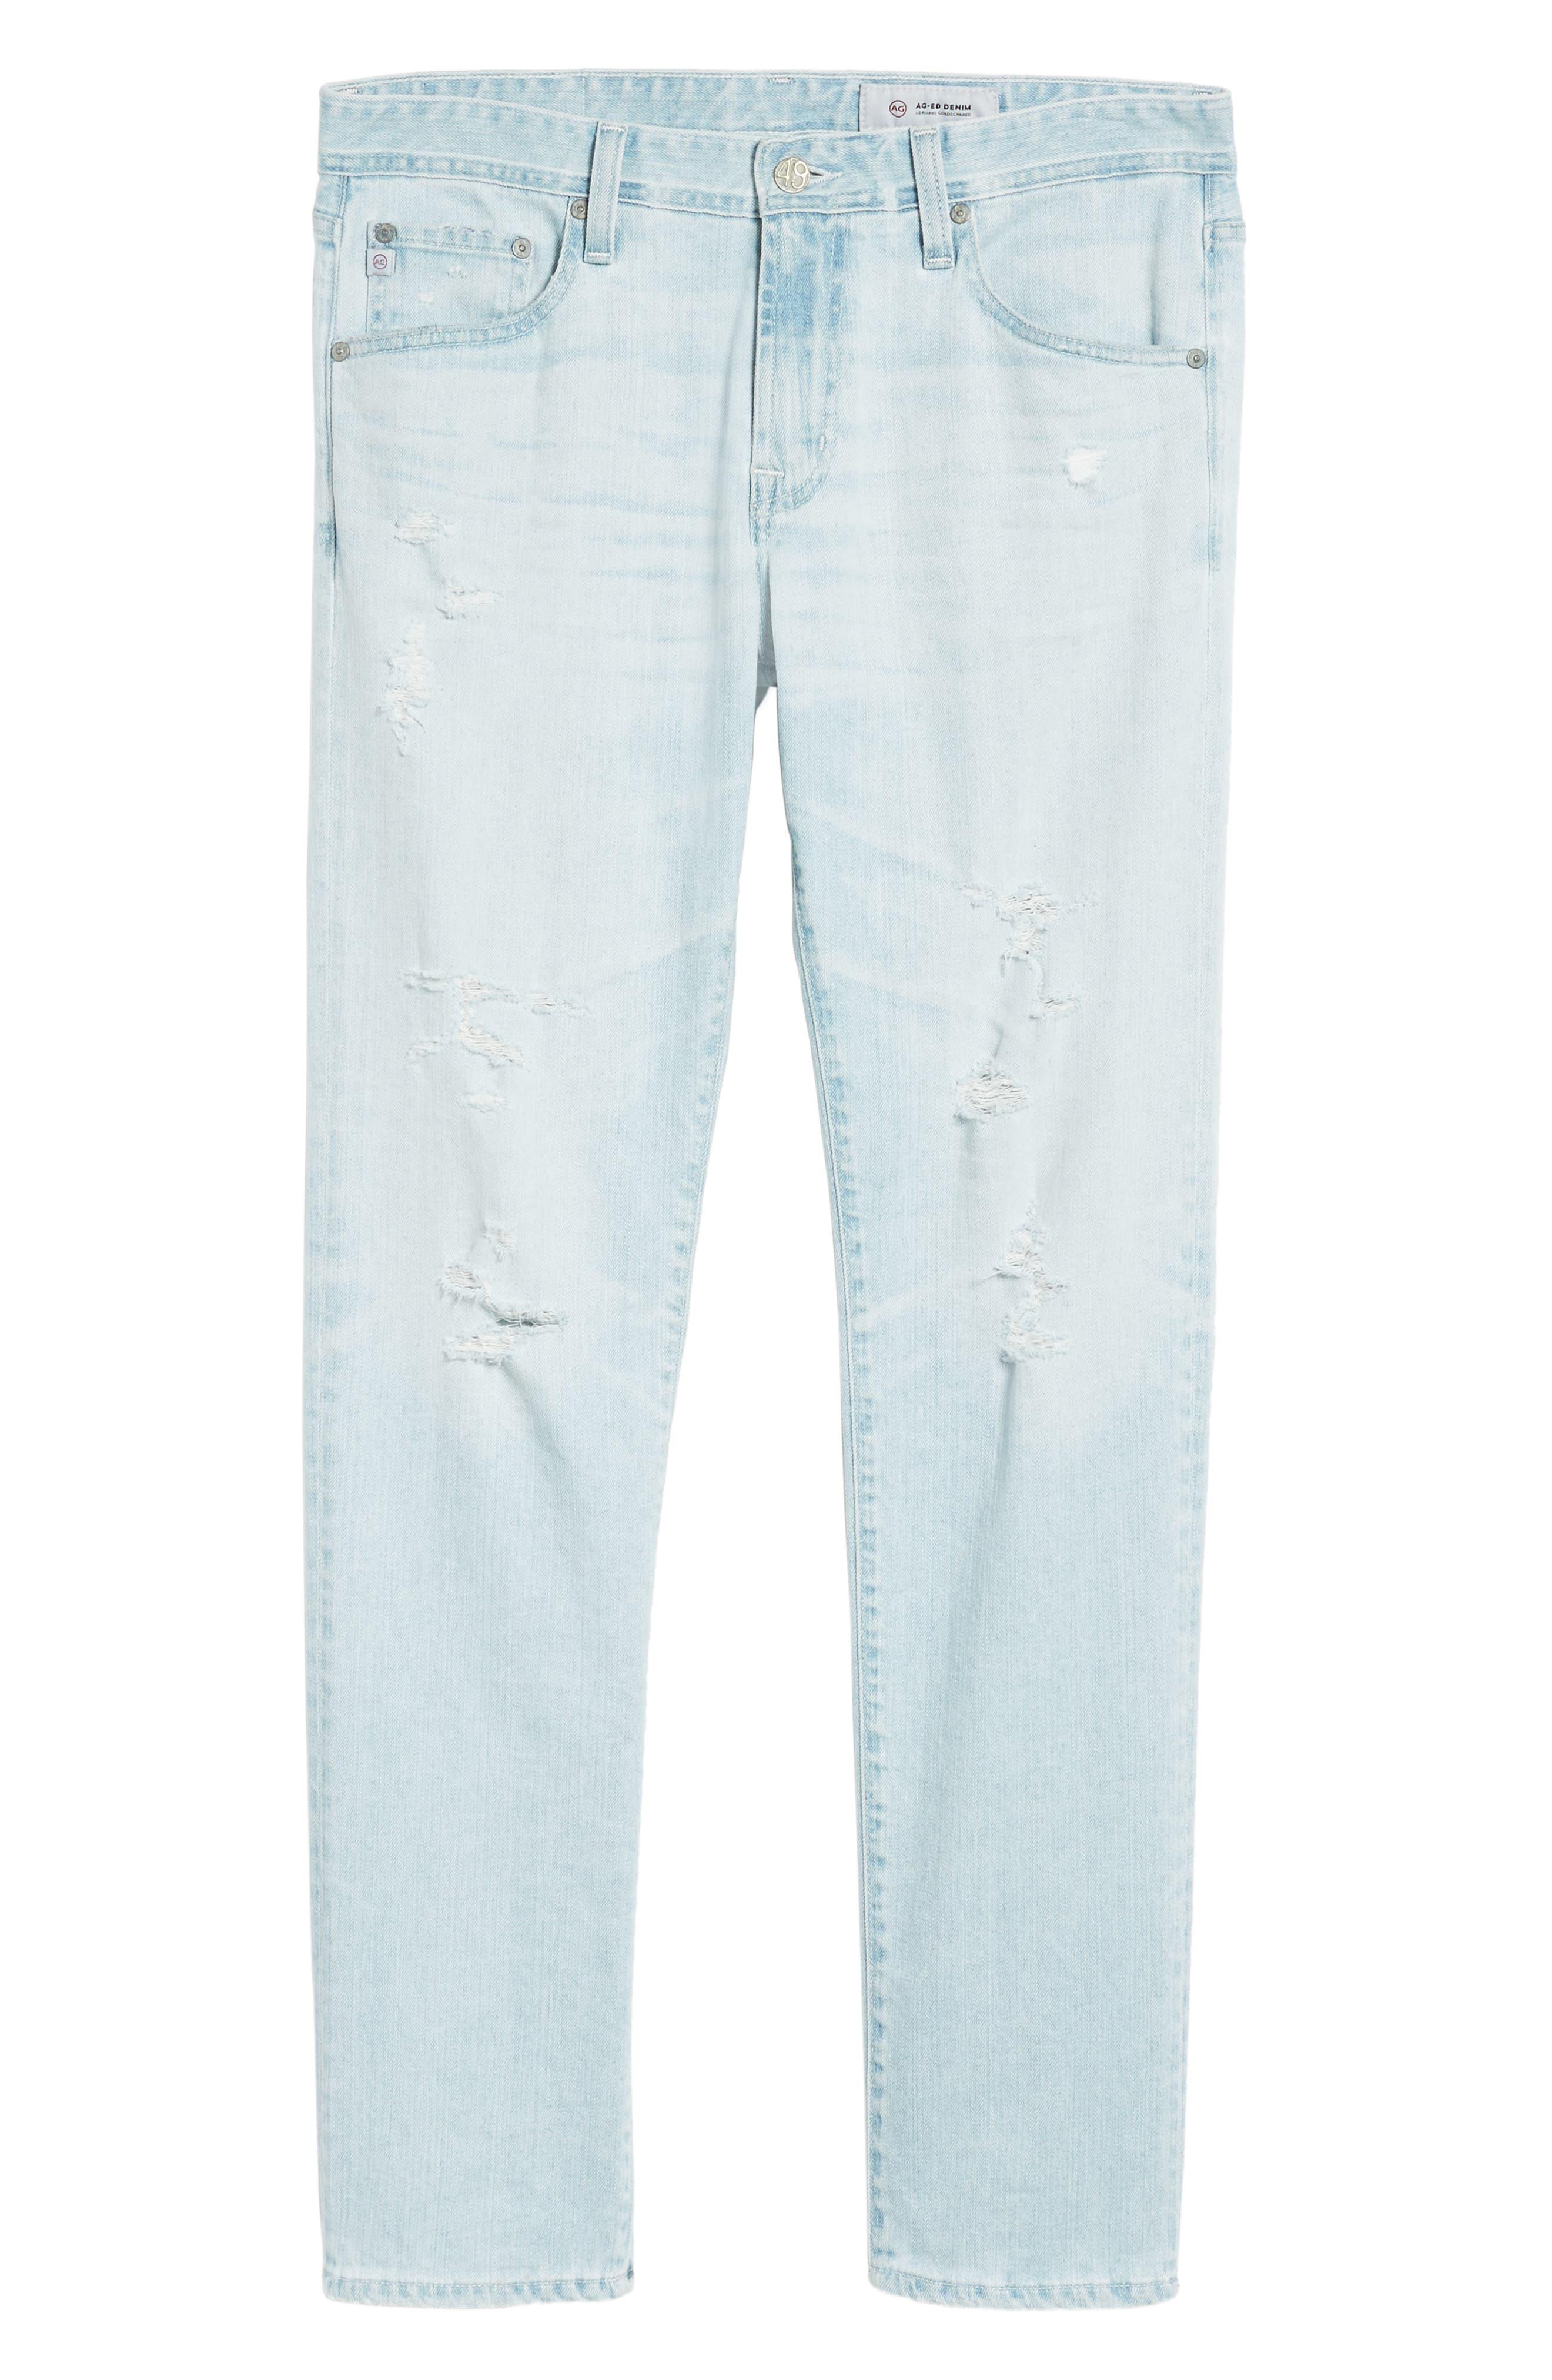 Tellis Slim Fit Jeans,                             Alternate thumbnail 6, color,                             27 Years Surfrider